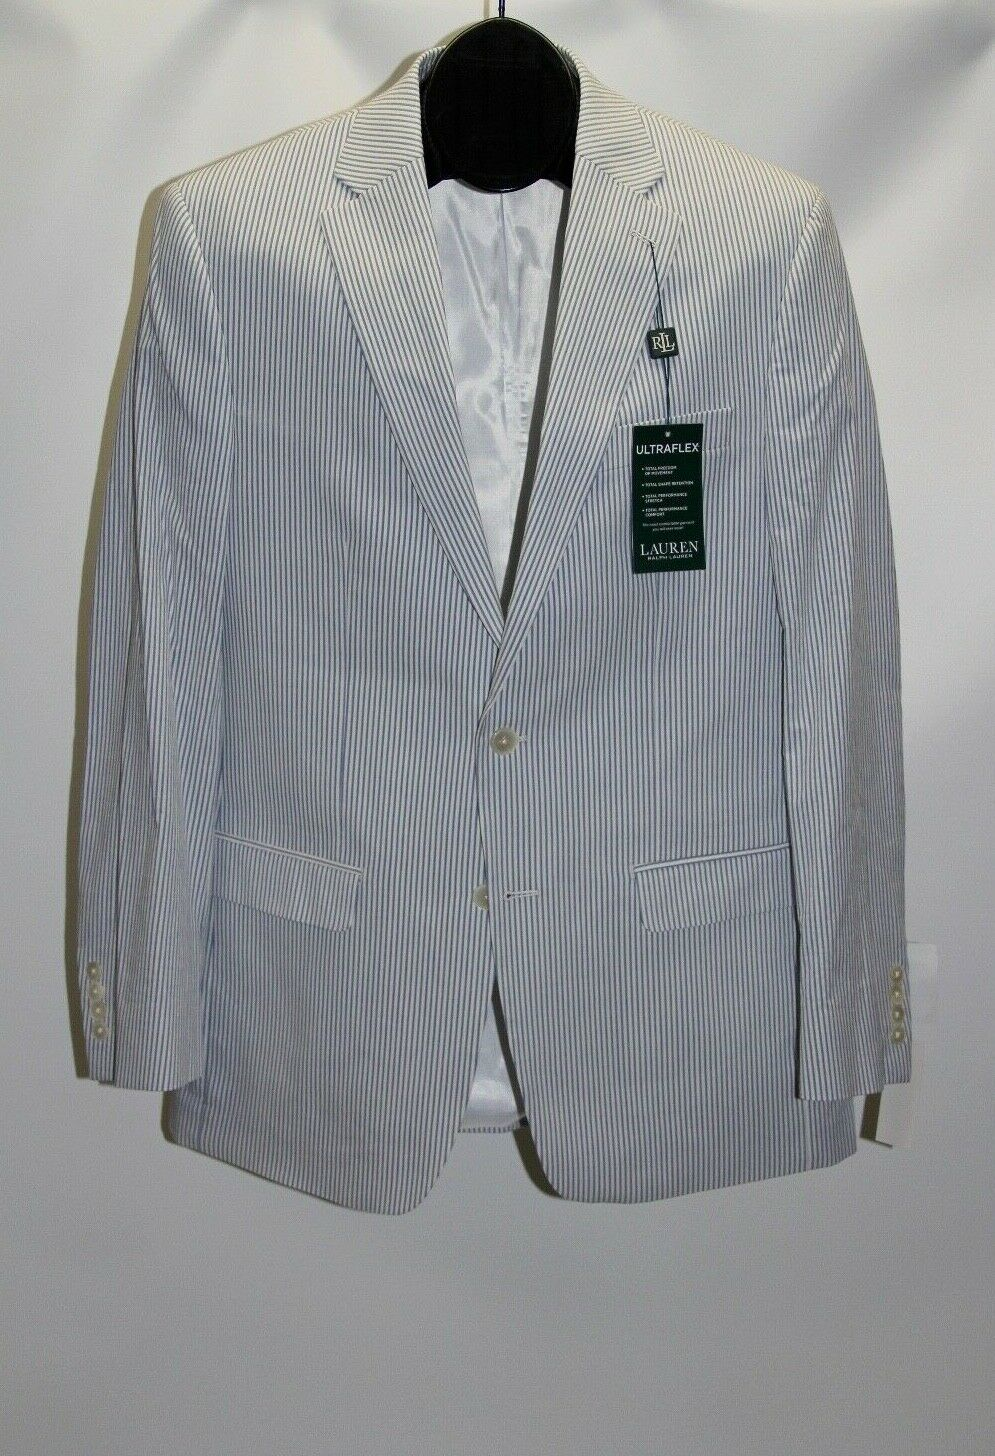 New Lauren Ralph Lauren Men's 40L Light bluee White Striped Ultraflex Sport Coat